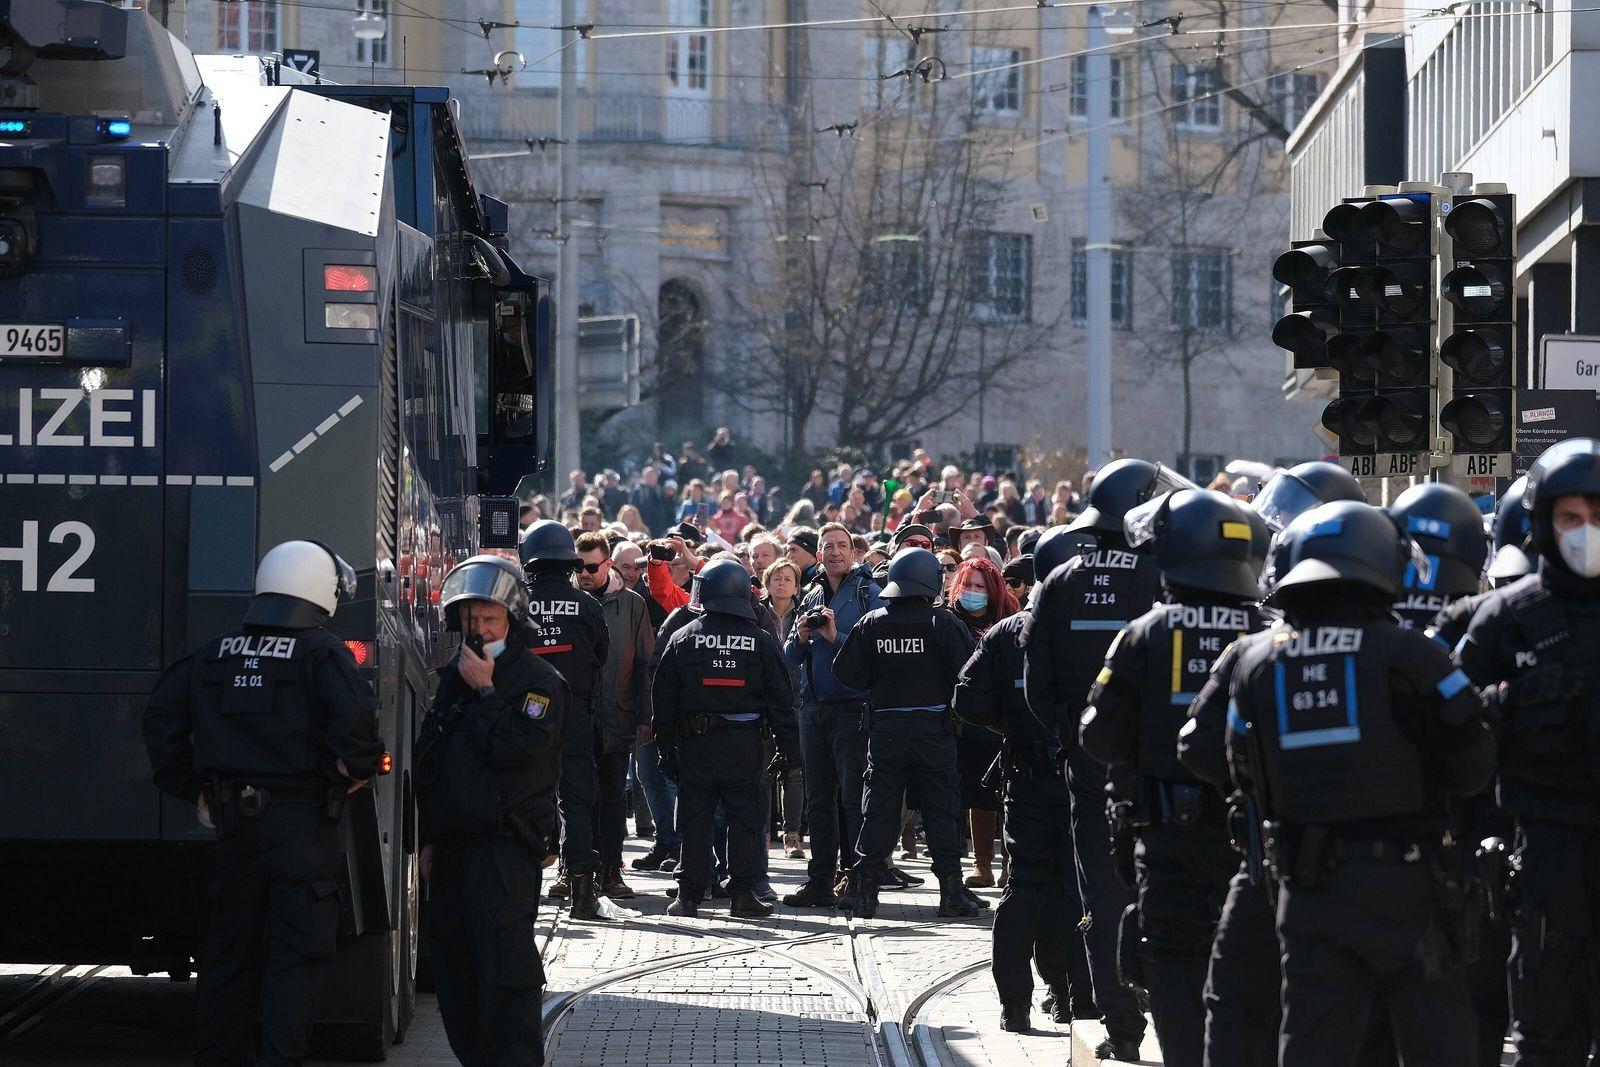 20.03.2020 xkhx Kassel, Innenstadt Demonstration der Querdenker gegen Corona-Beschränkungen (Freie Bürger Kassel - Pegid